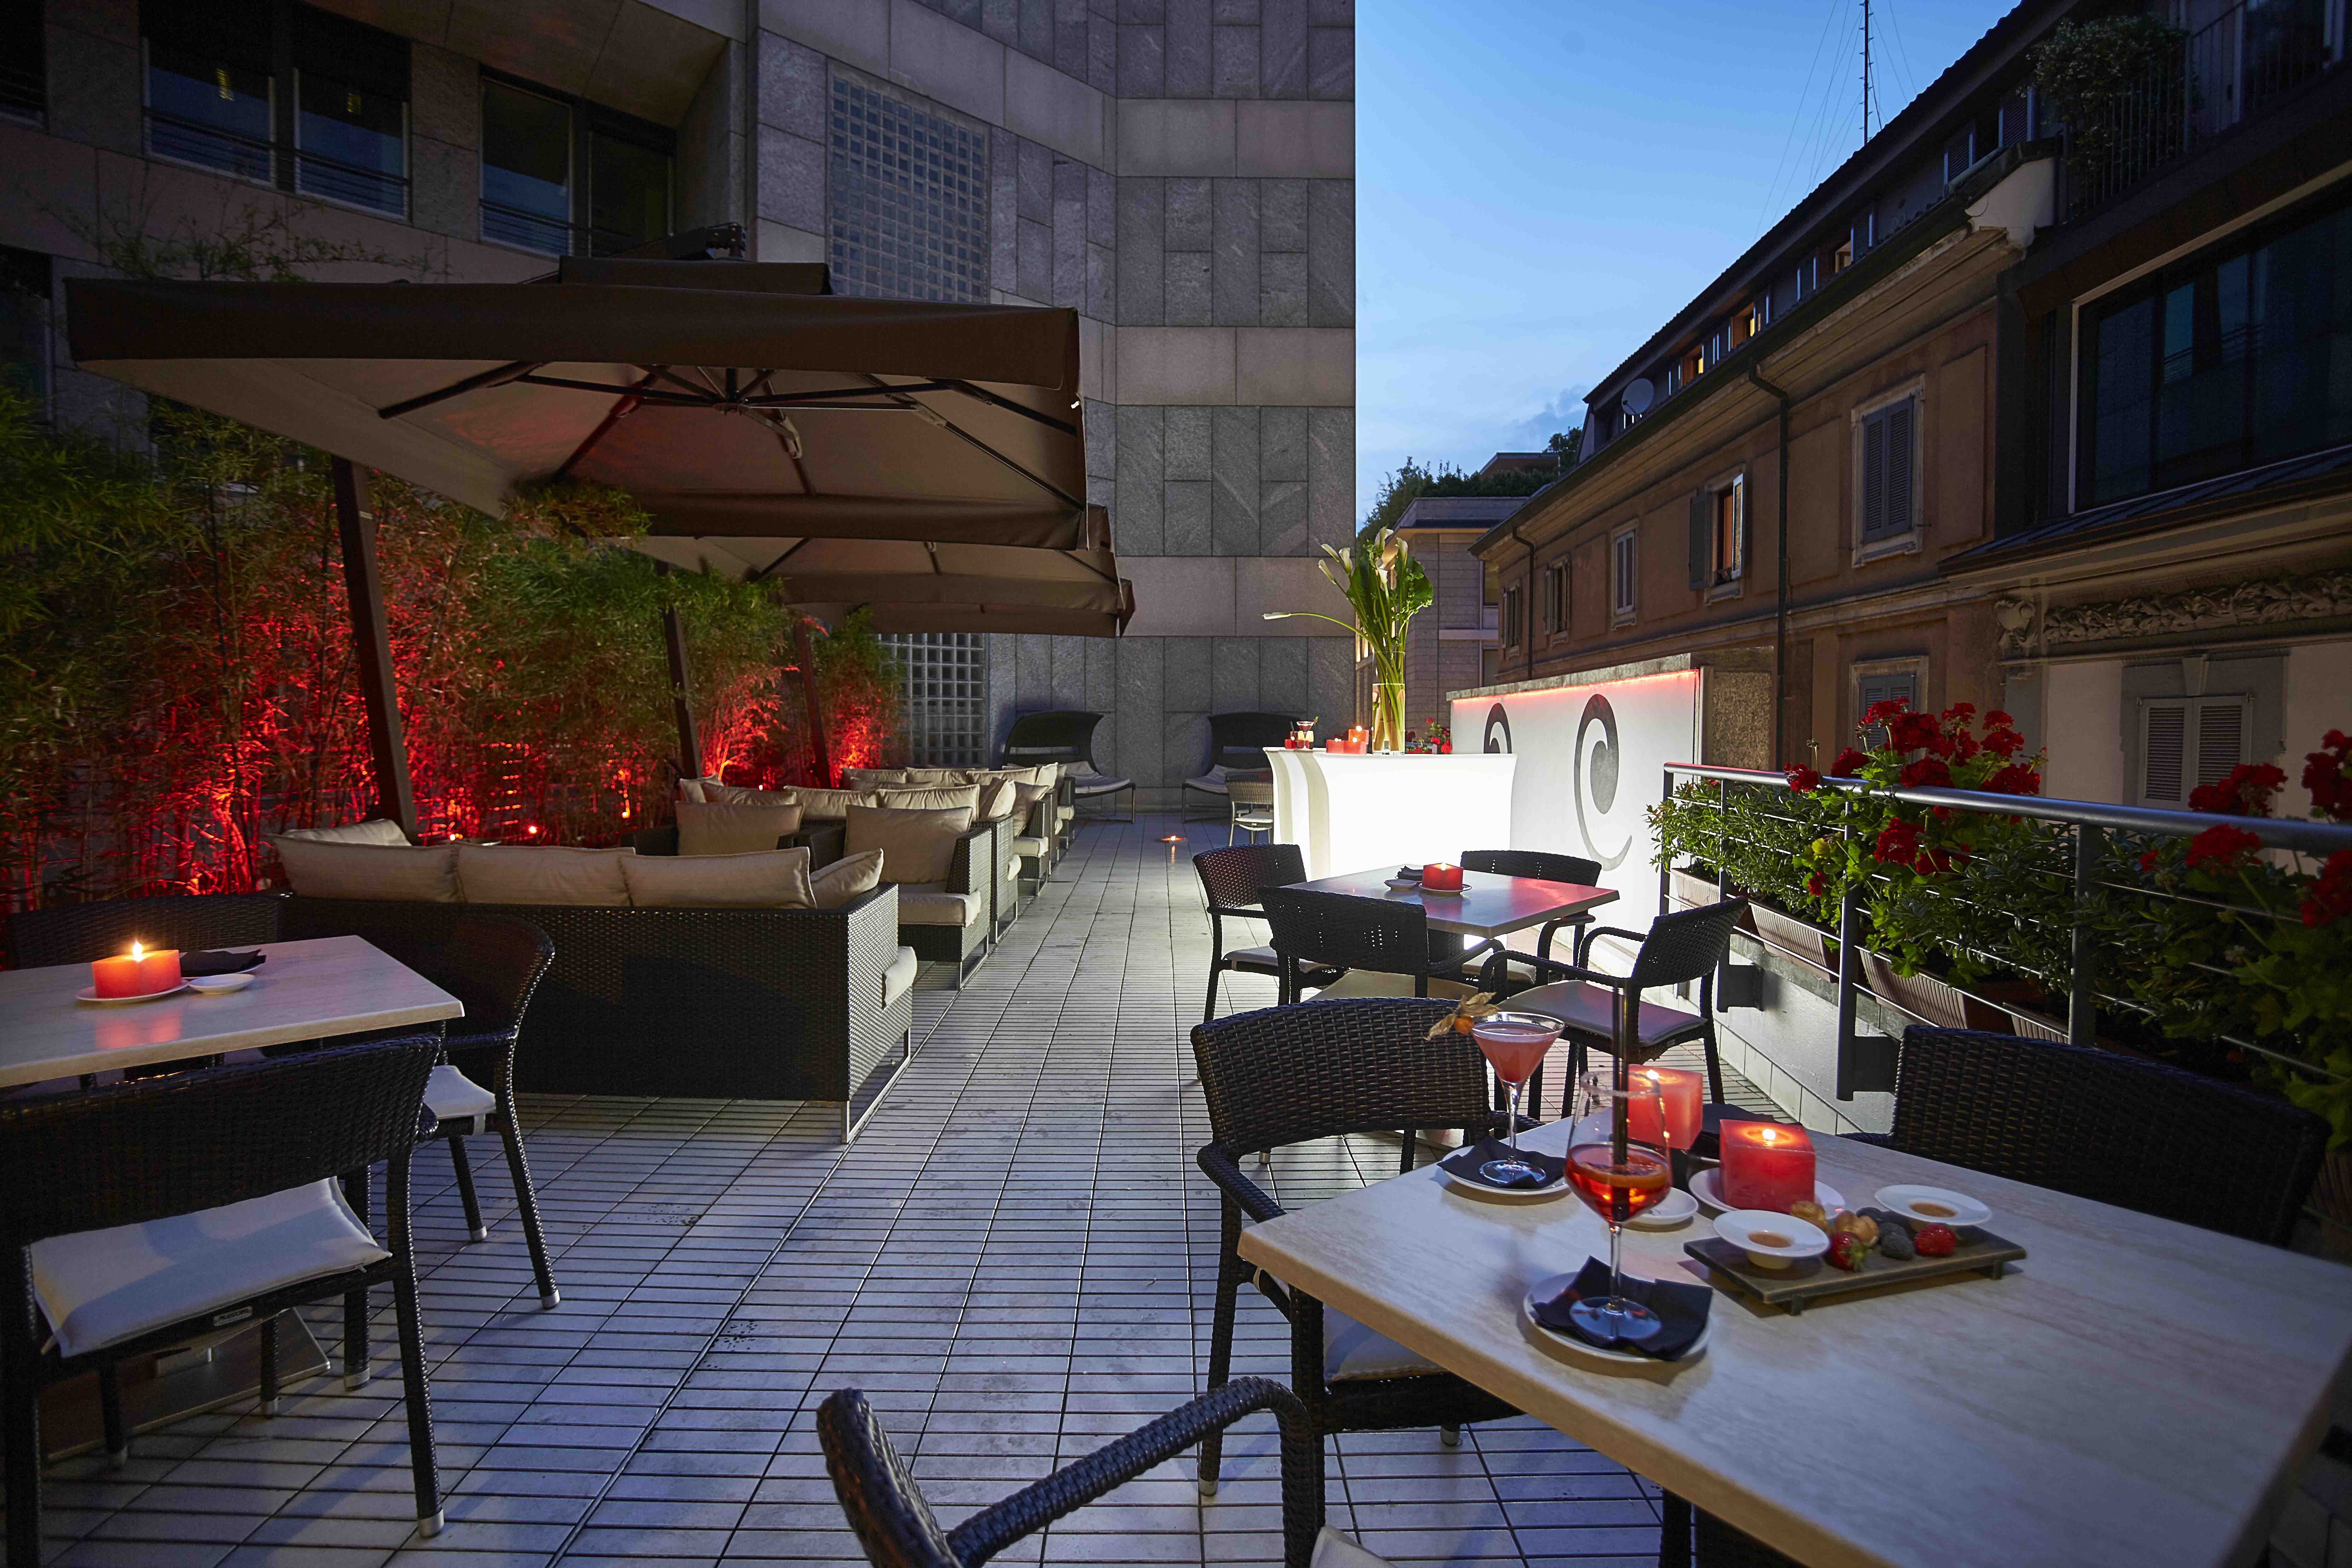 Stunning terrazza campari milano photos house design for Grey hotel milano